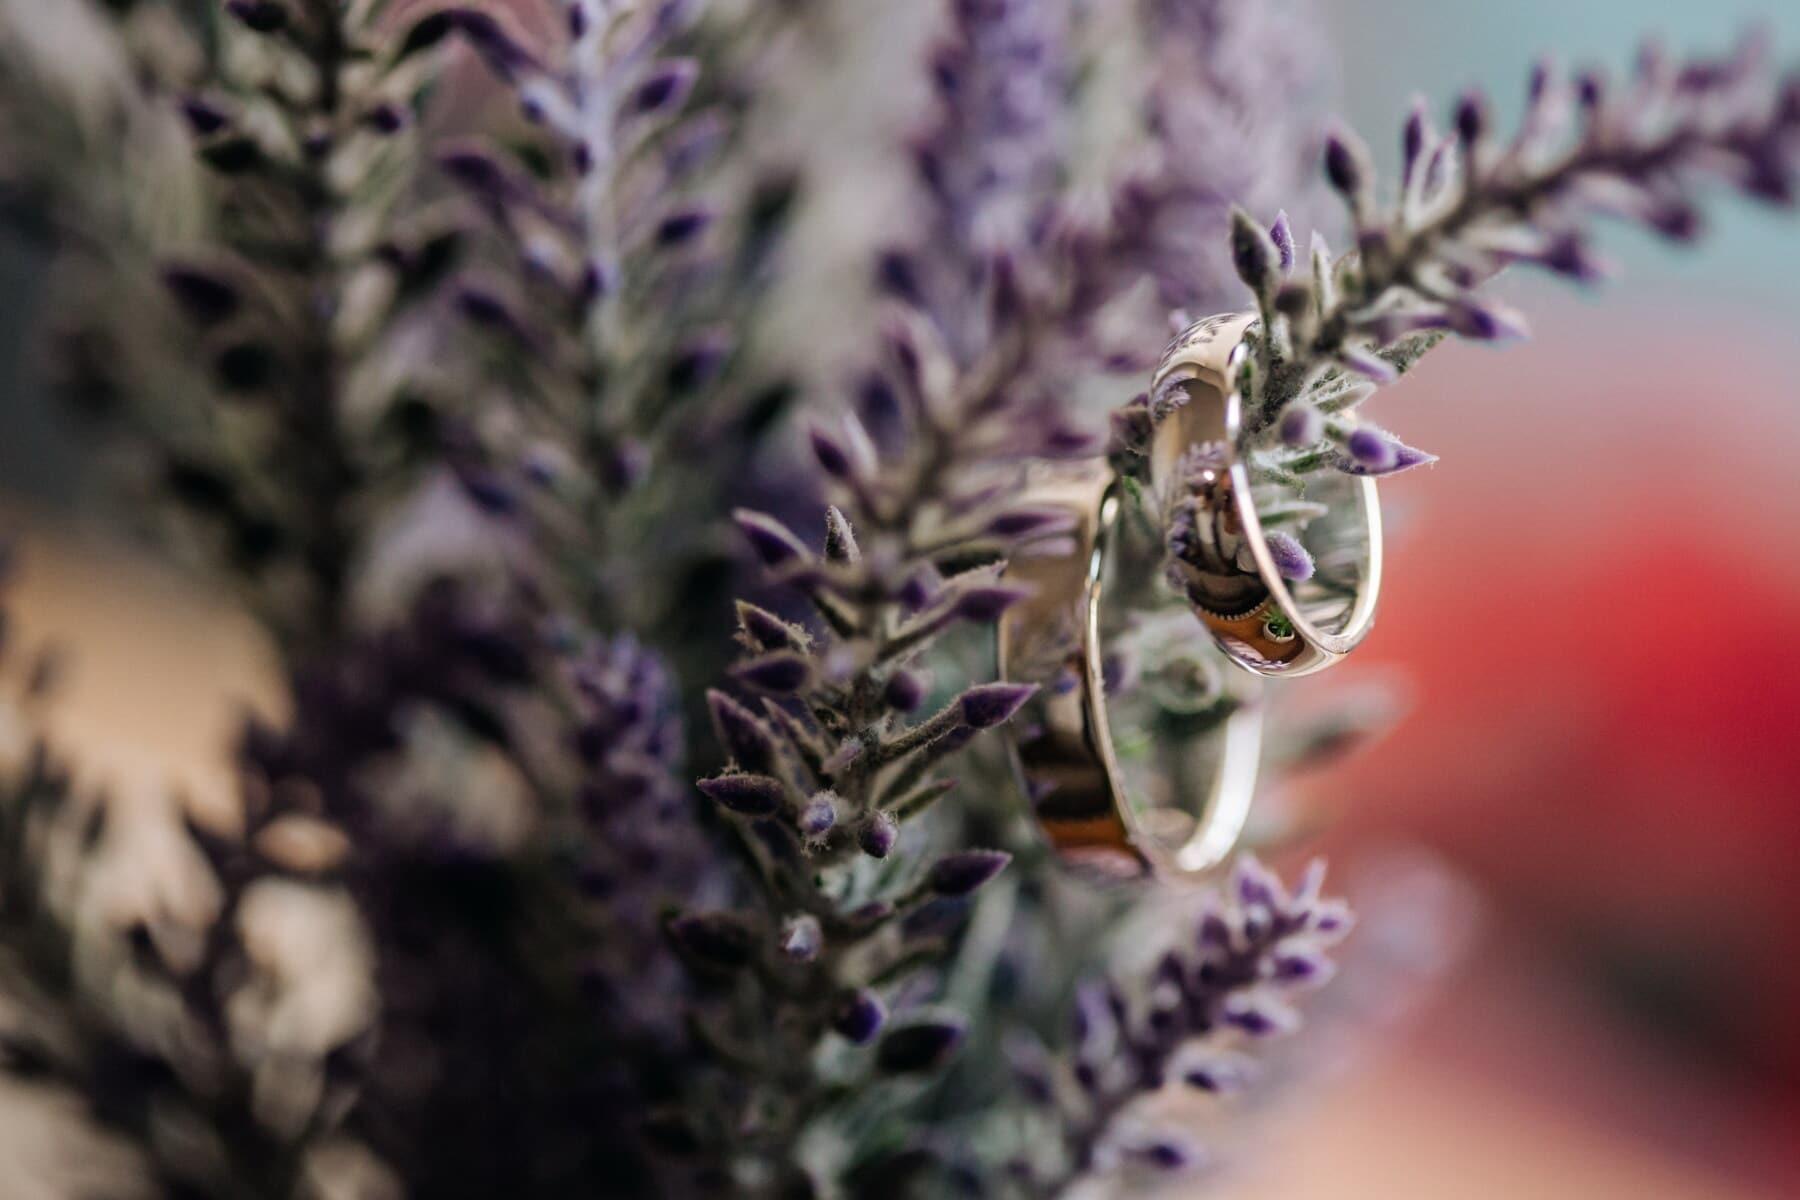 Lavendel, Blumentopf, Ringe, Schmuck, Gold, Fokus, Reflexion, Detail, Kraut, Blume